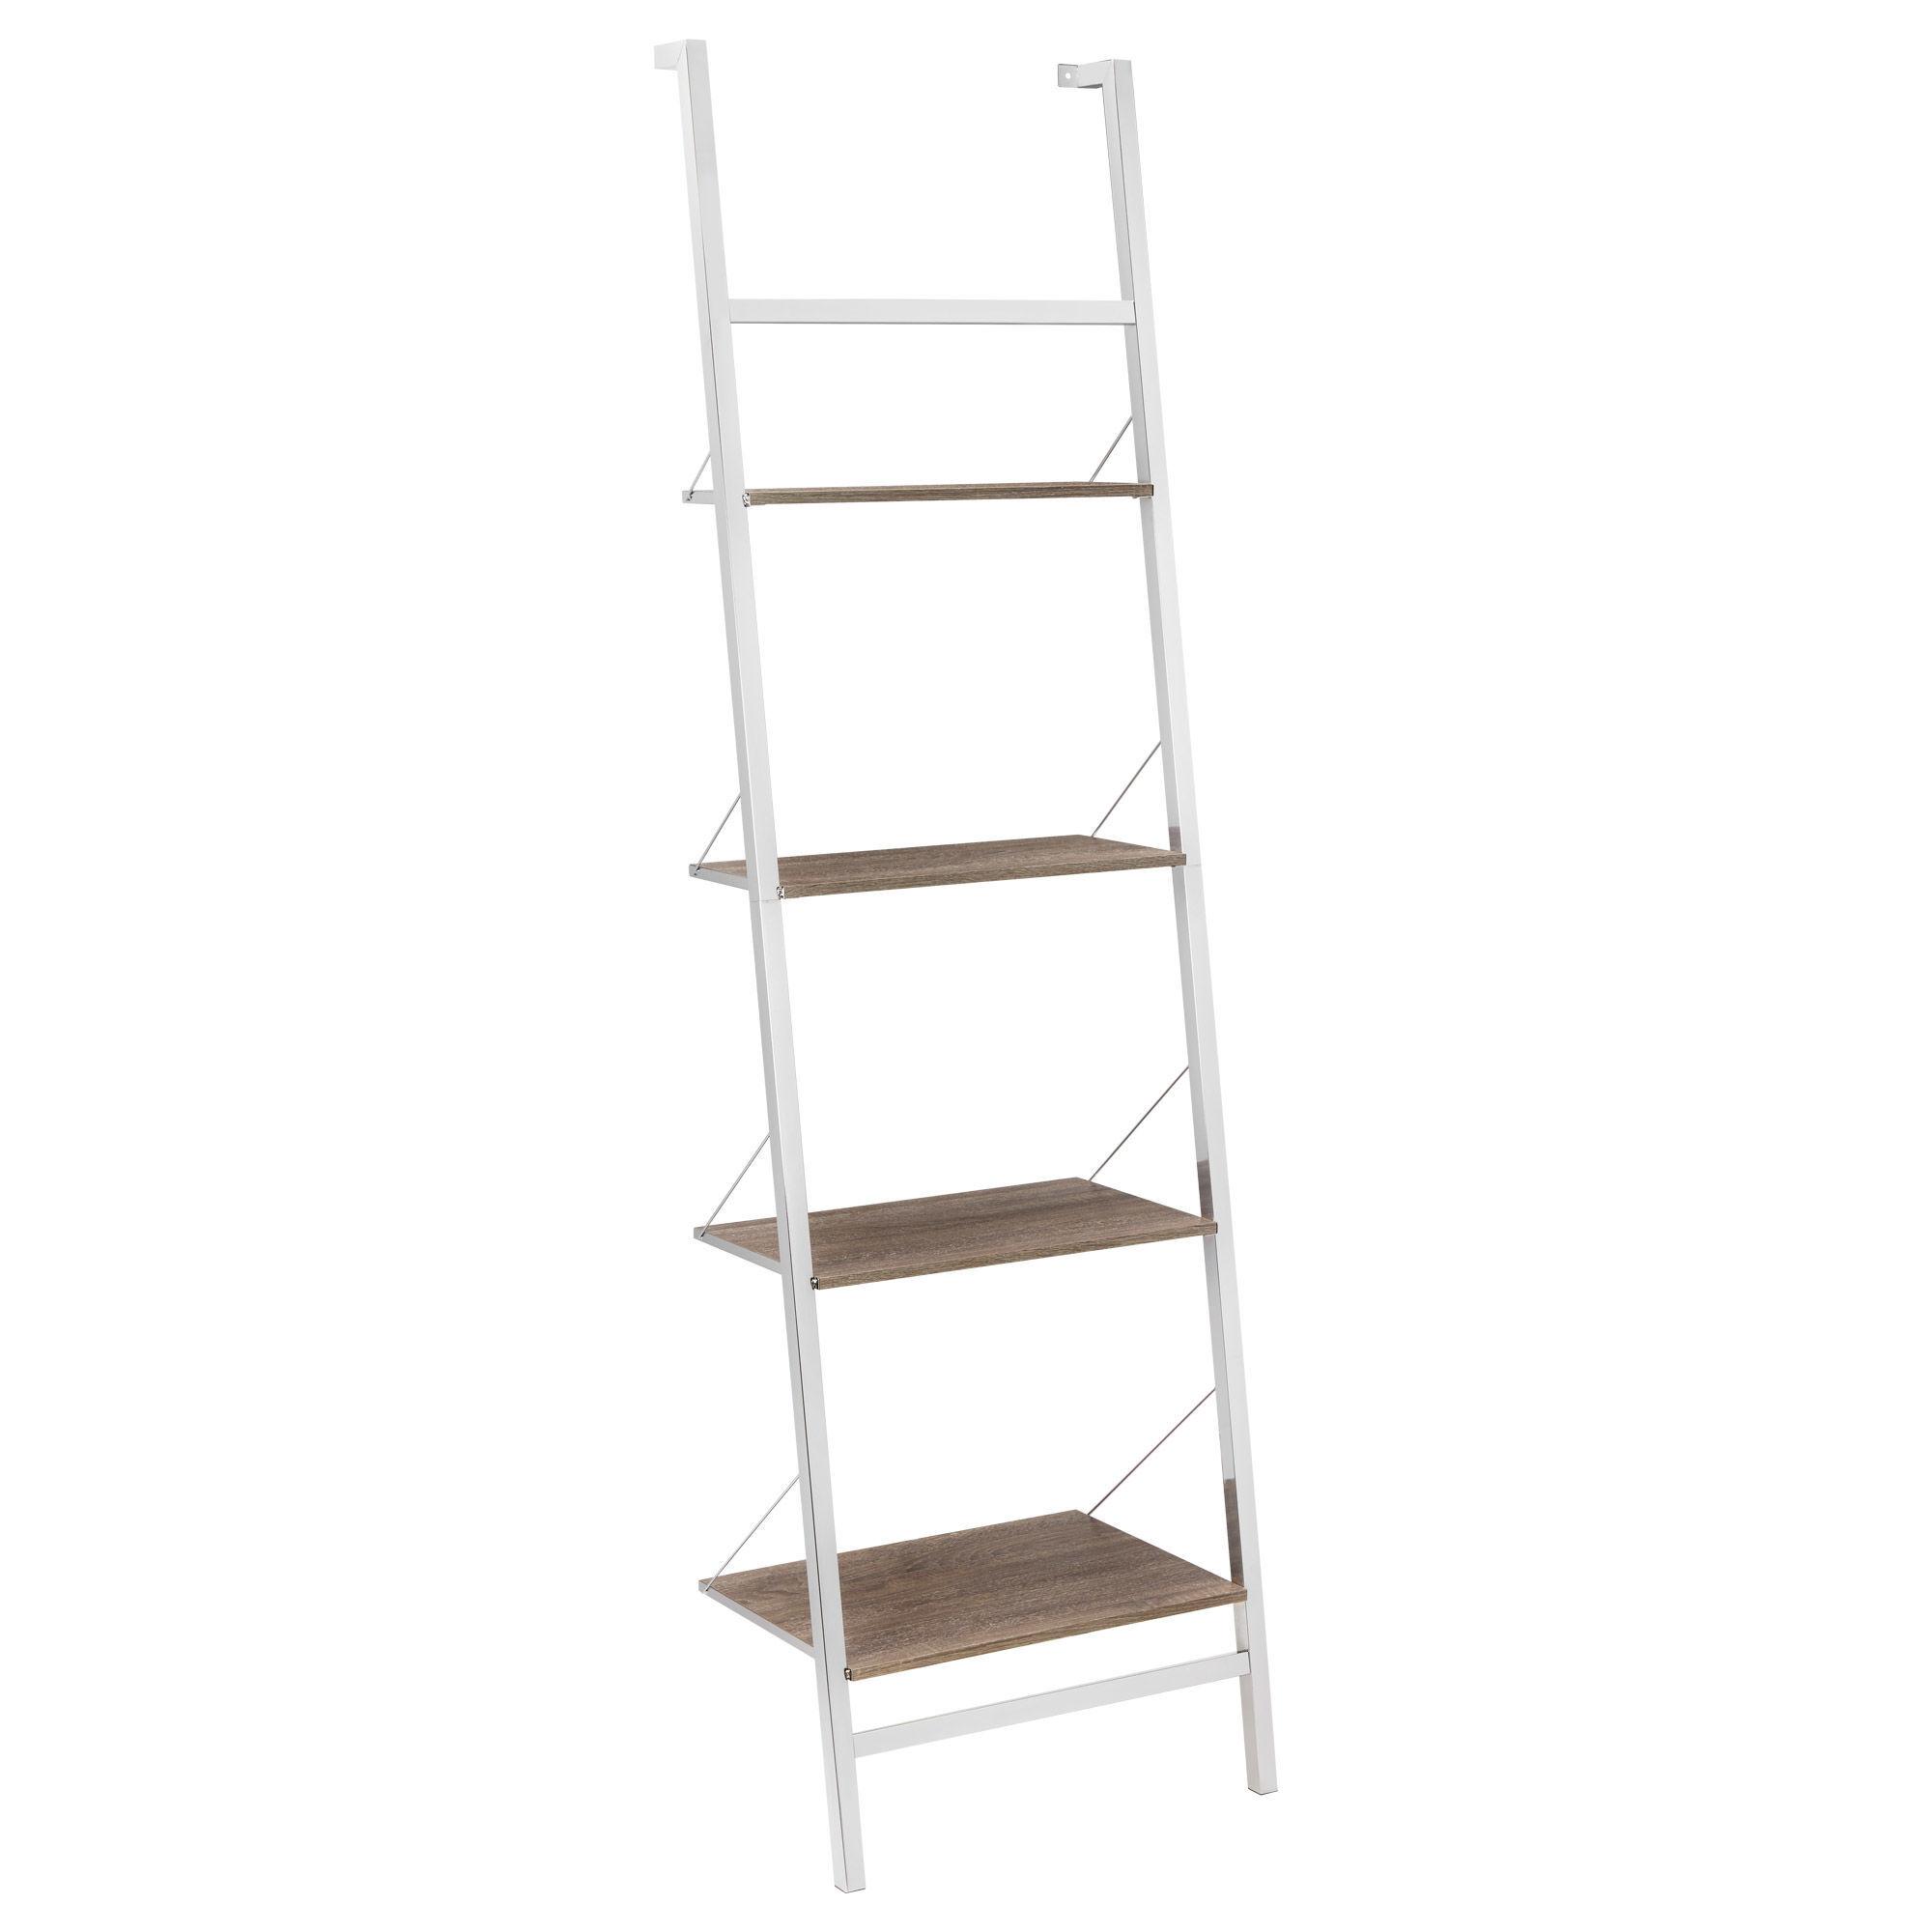 Four Tier Wall Ladder Shelf